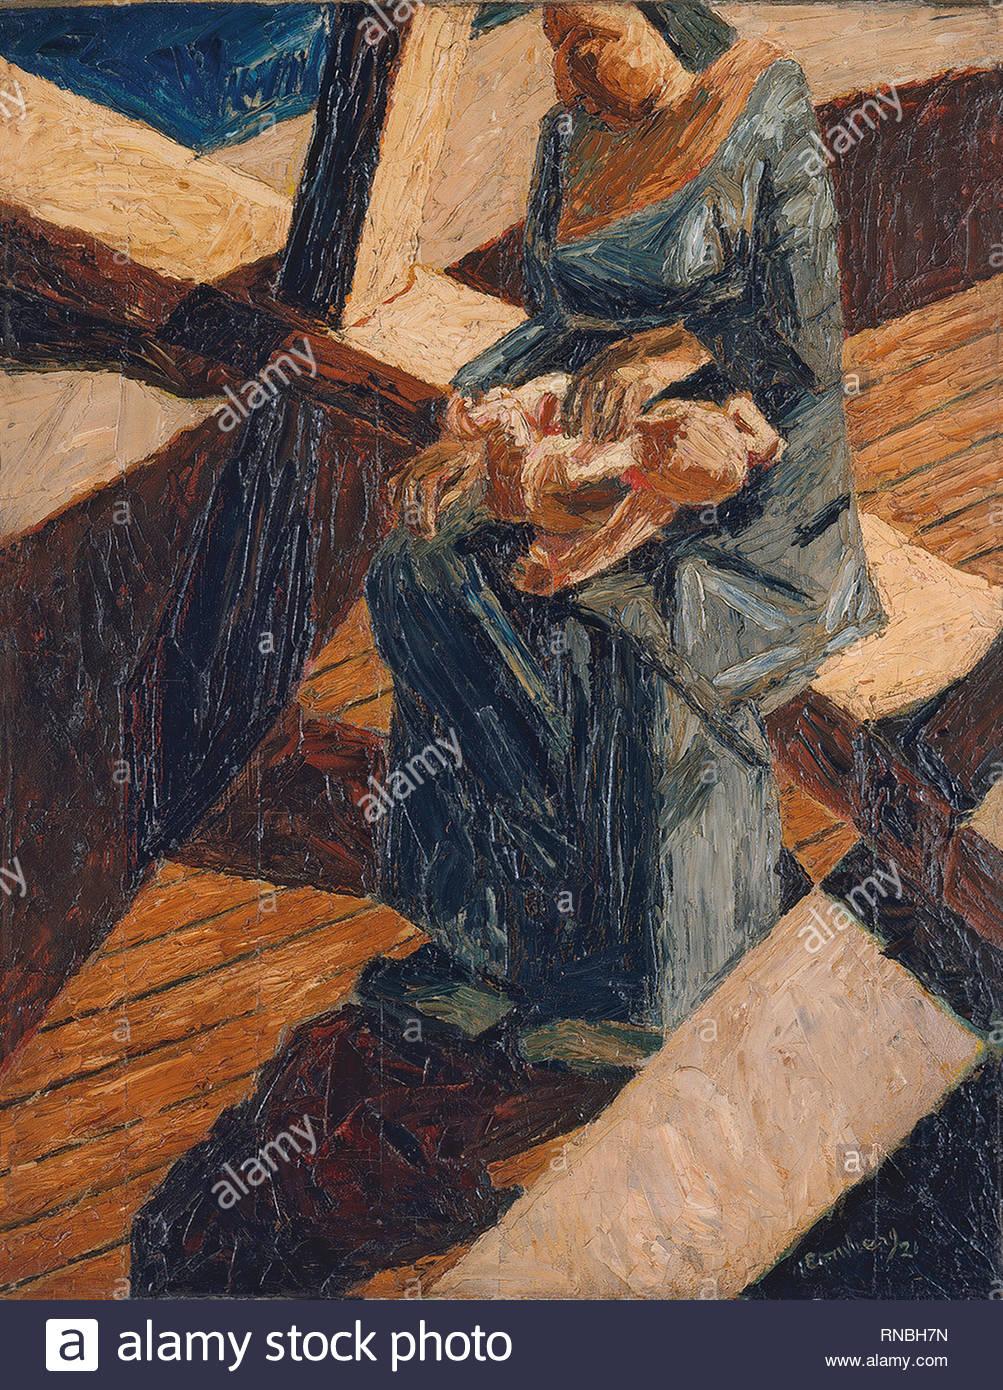 David Bomberg (Birmingham, 1890-London, 1957). Bargee (madre e bambino) (1921). Olio su tela. 91,5 x 71 cm. Museo: Museo Nacional Thyssen-Bornemisza, Madrid. Immagini Stock